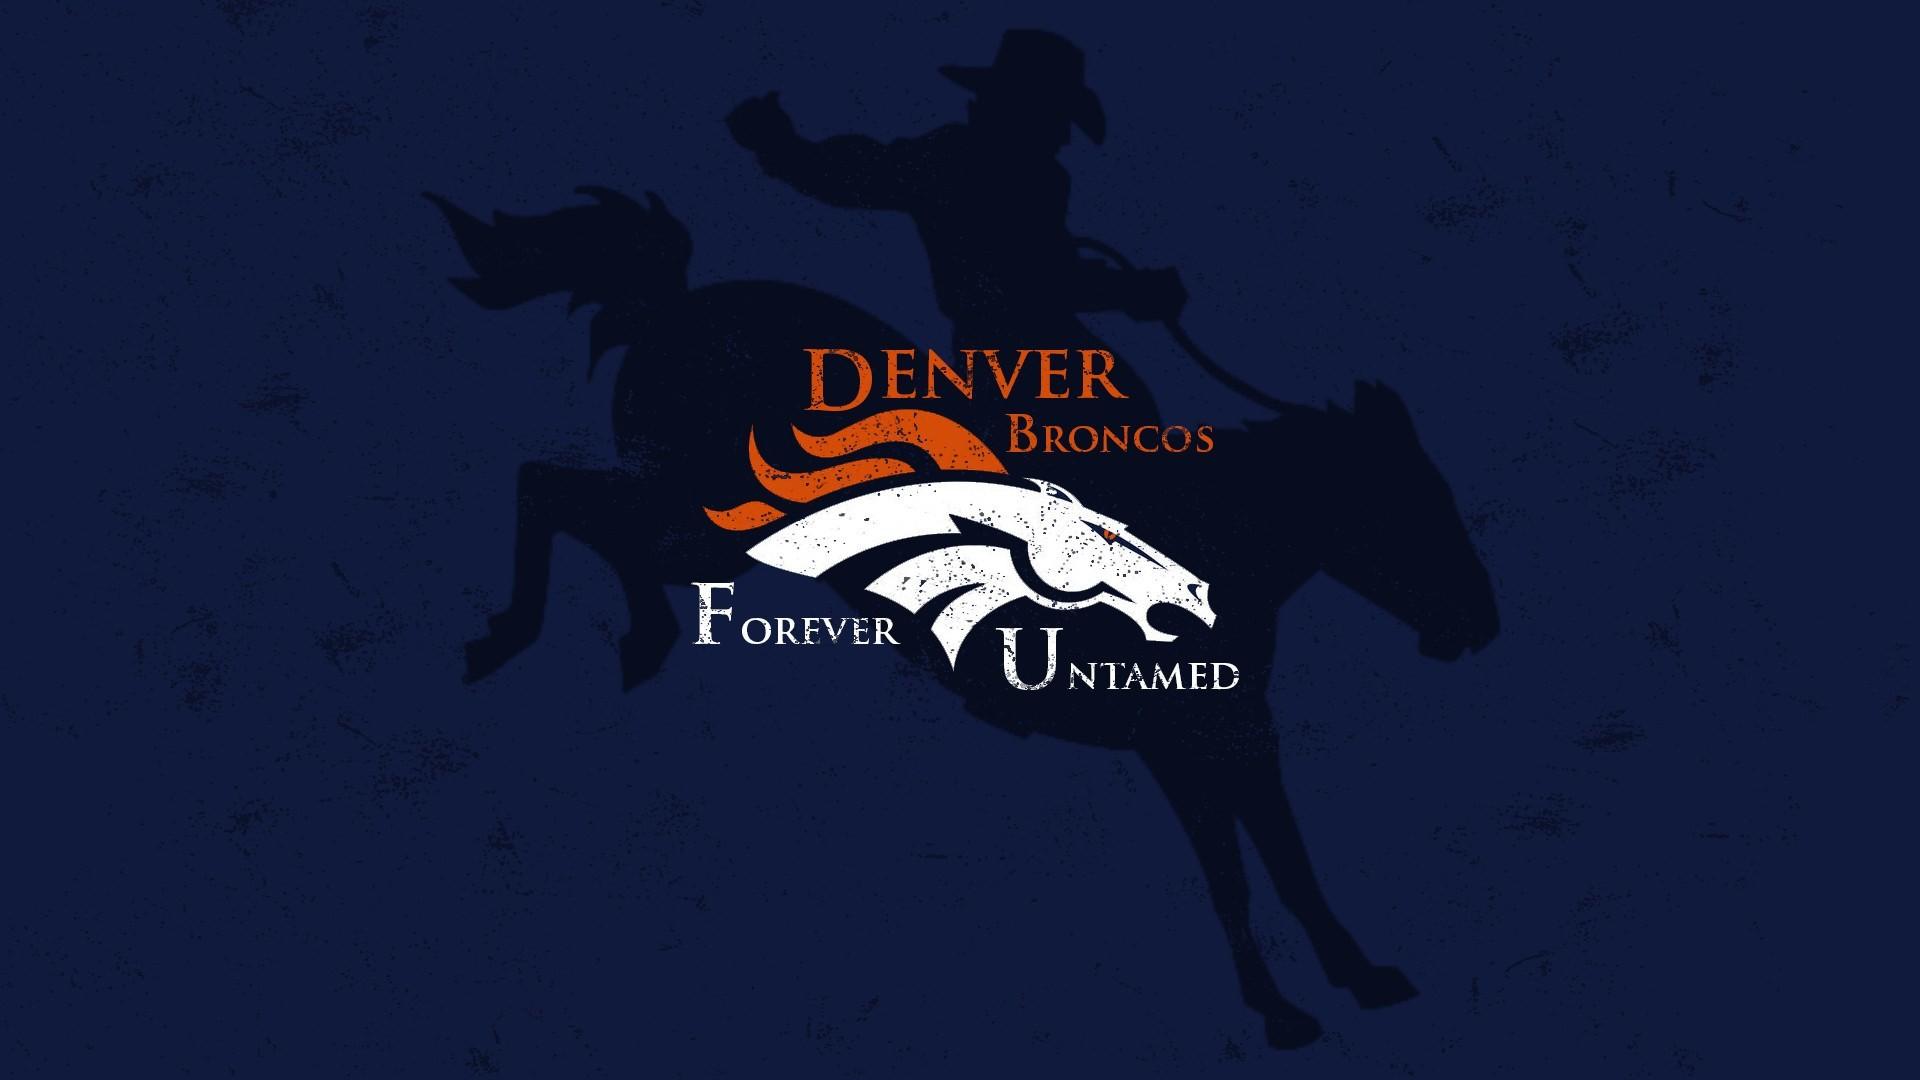 Denver Broncos Wallpaper Free   Free Wallpapers   Pinterest   Denver  broncos wallpaper and Wallpaper